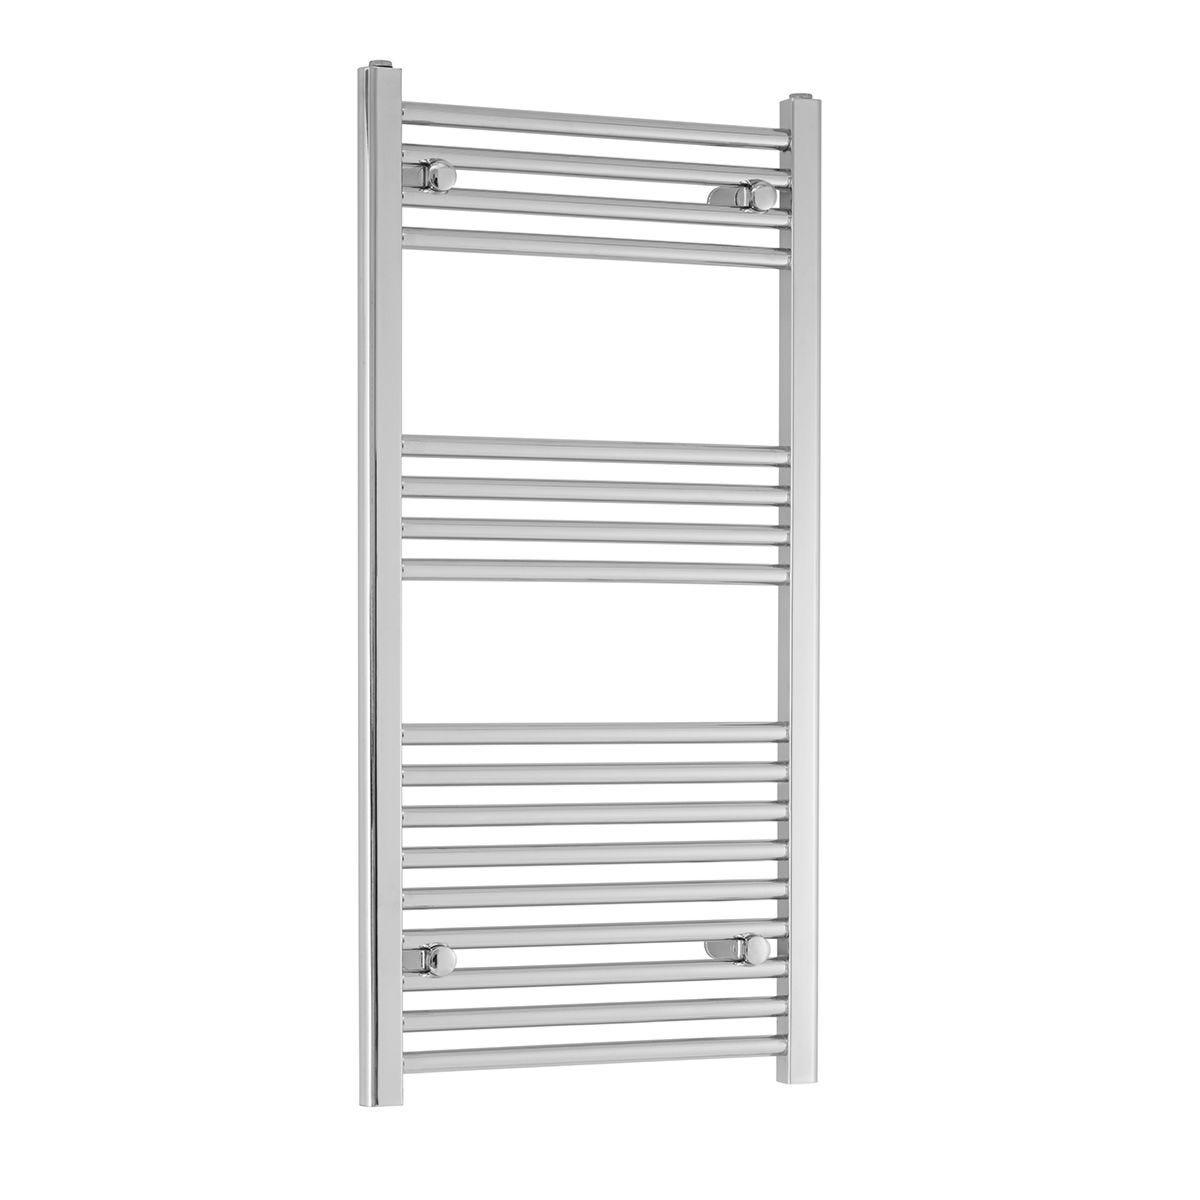 Heating Style Blythe Ladder Rail 1200x400mm Straight - Chrome